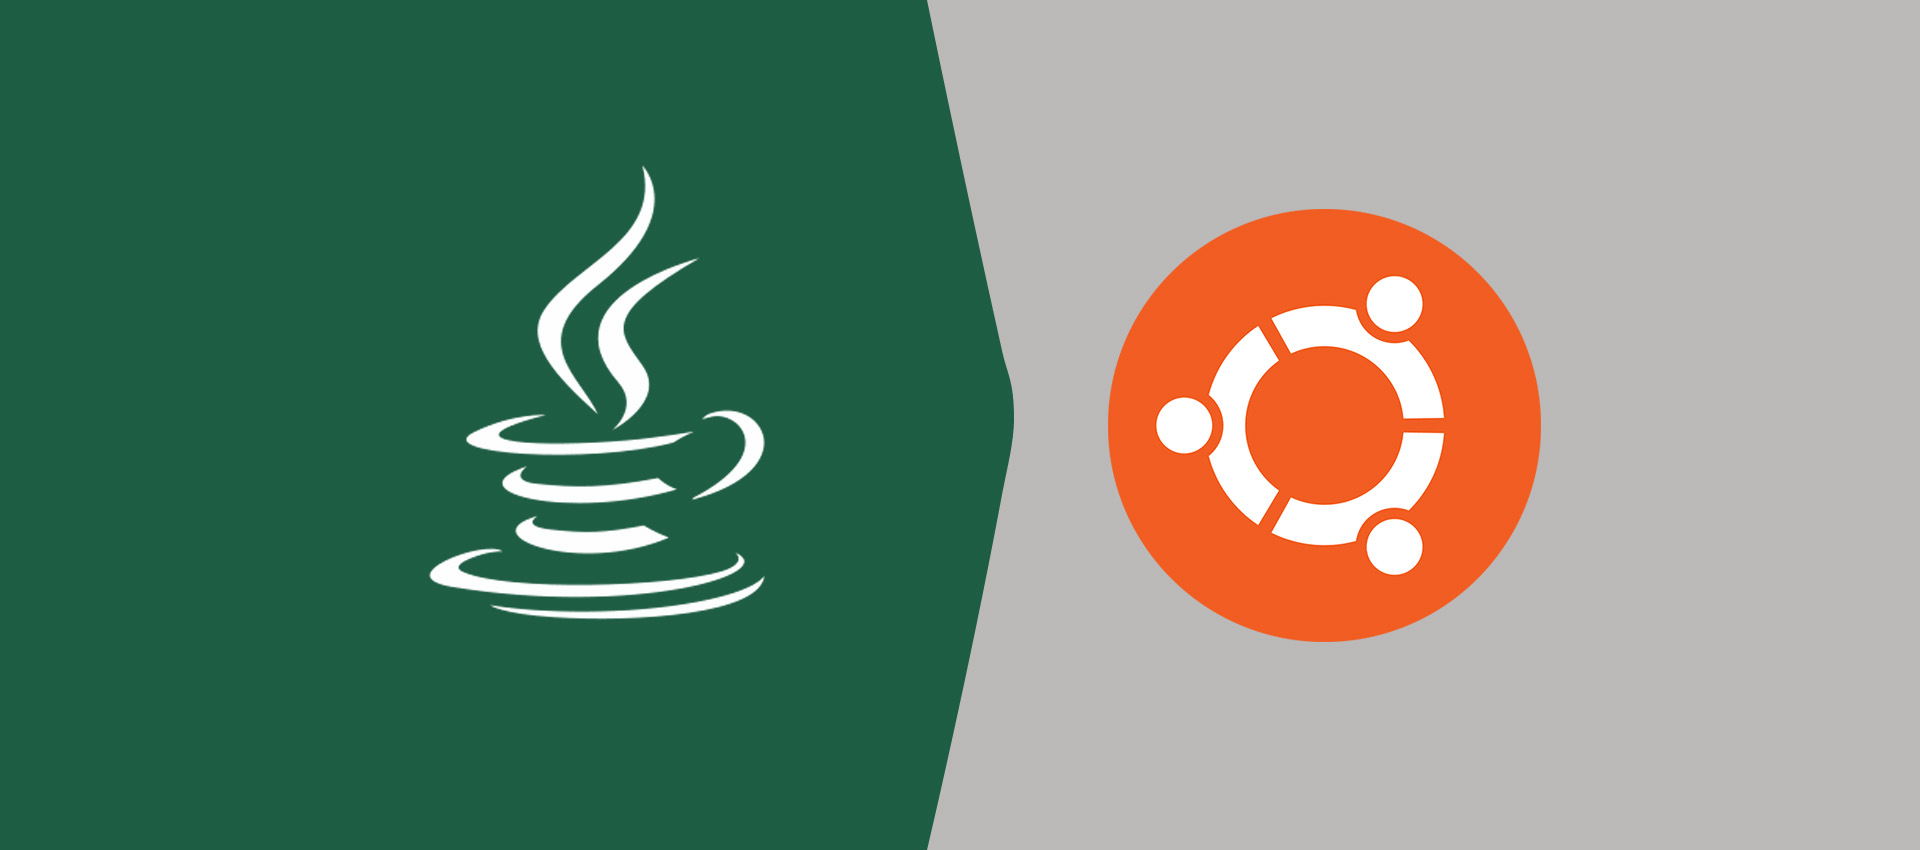 How To Install Java 17 On Ubuntu 20.04 LTS